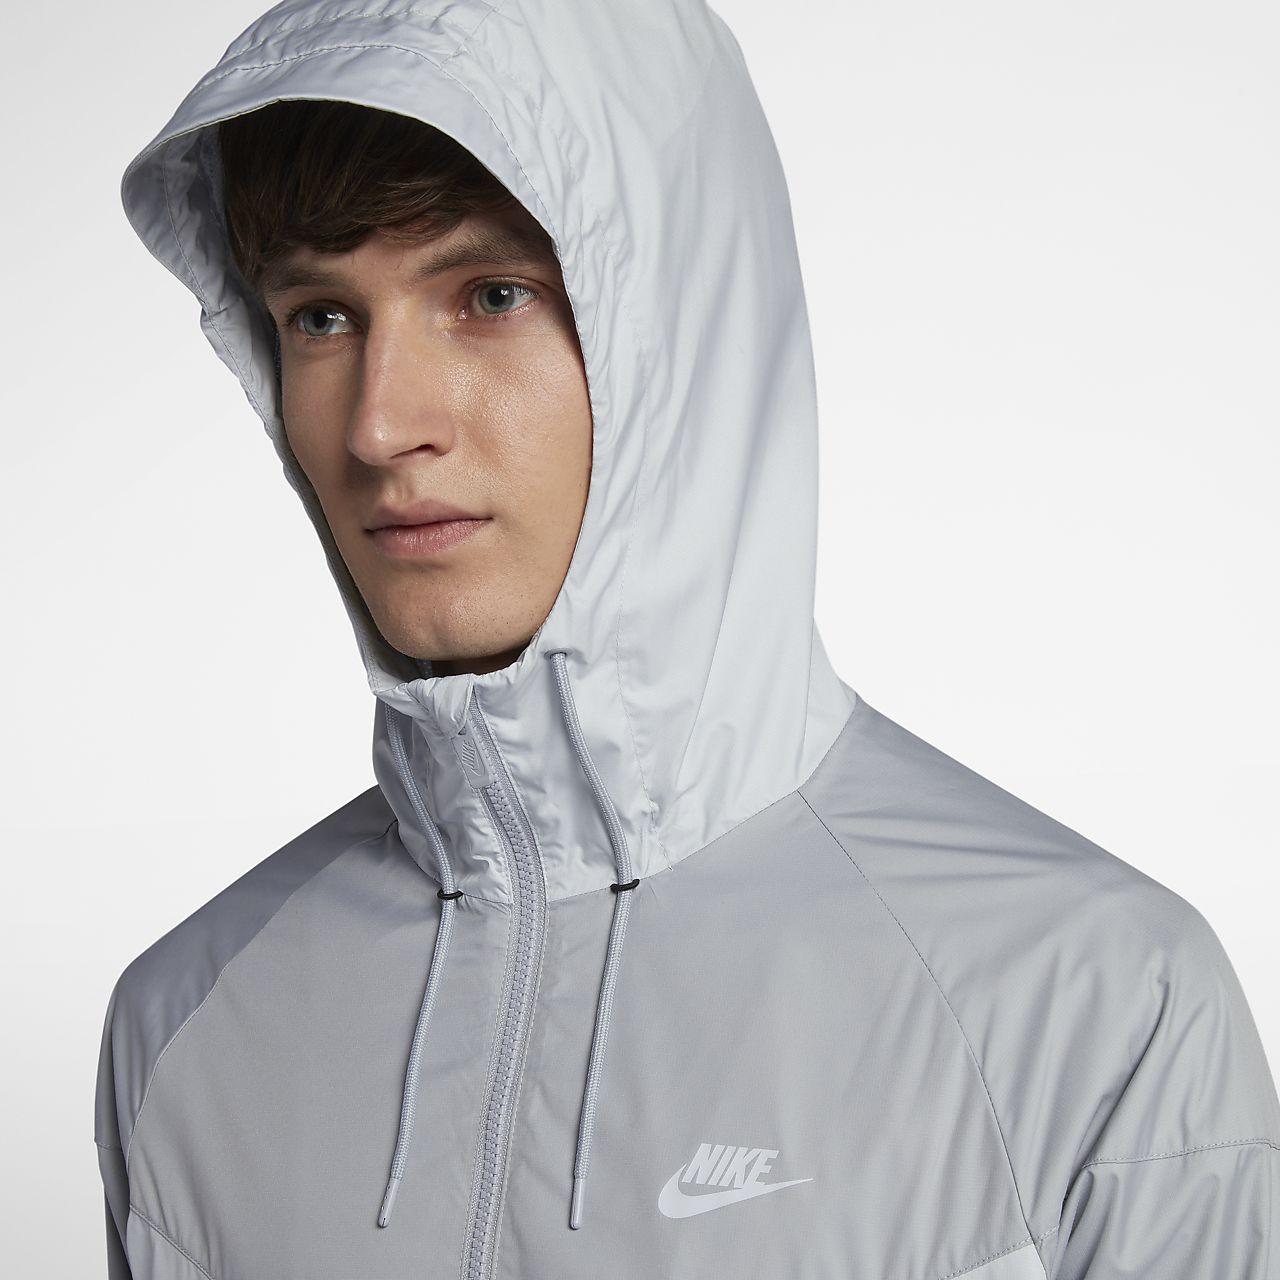 giacca leggera nike sportswear uomo